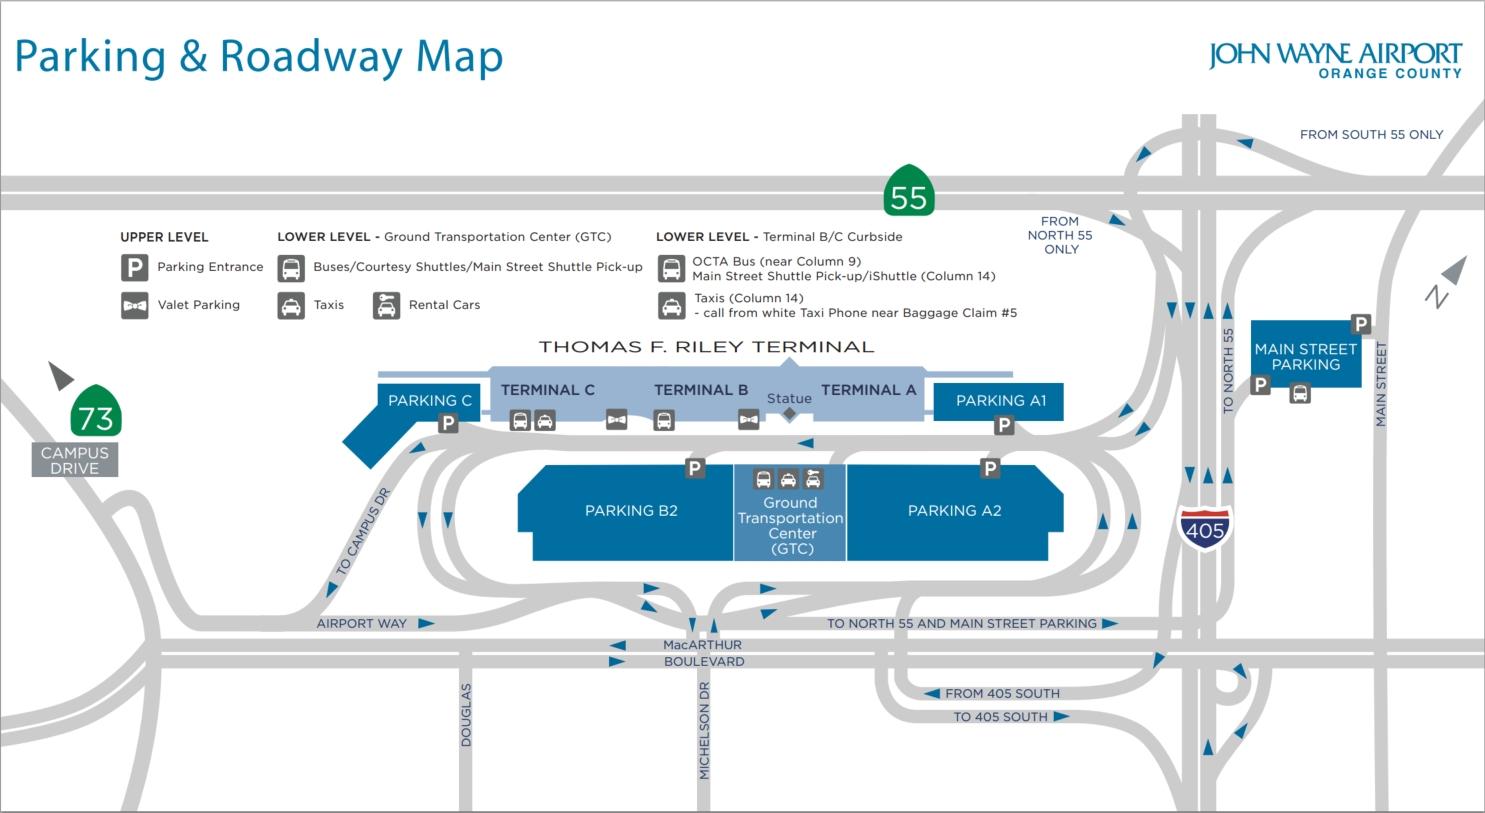 John Wayne Aiport Parking Map   Airport Parking Guides within Miami International Airport Car Rental Center Map